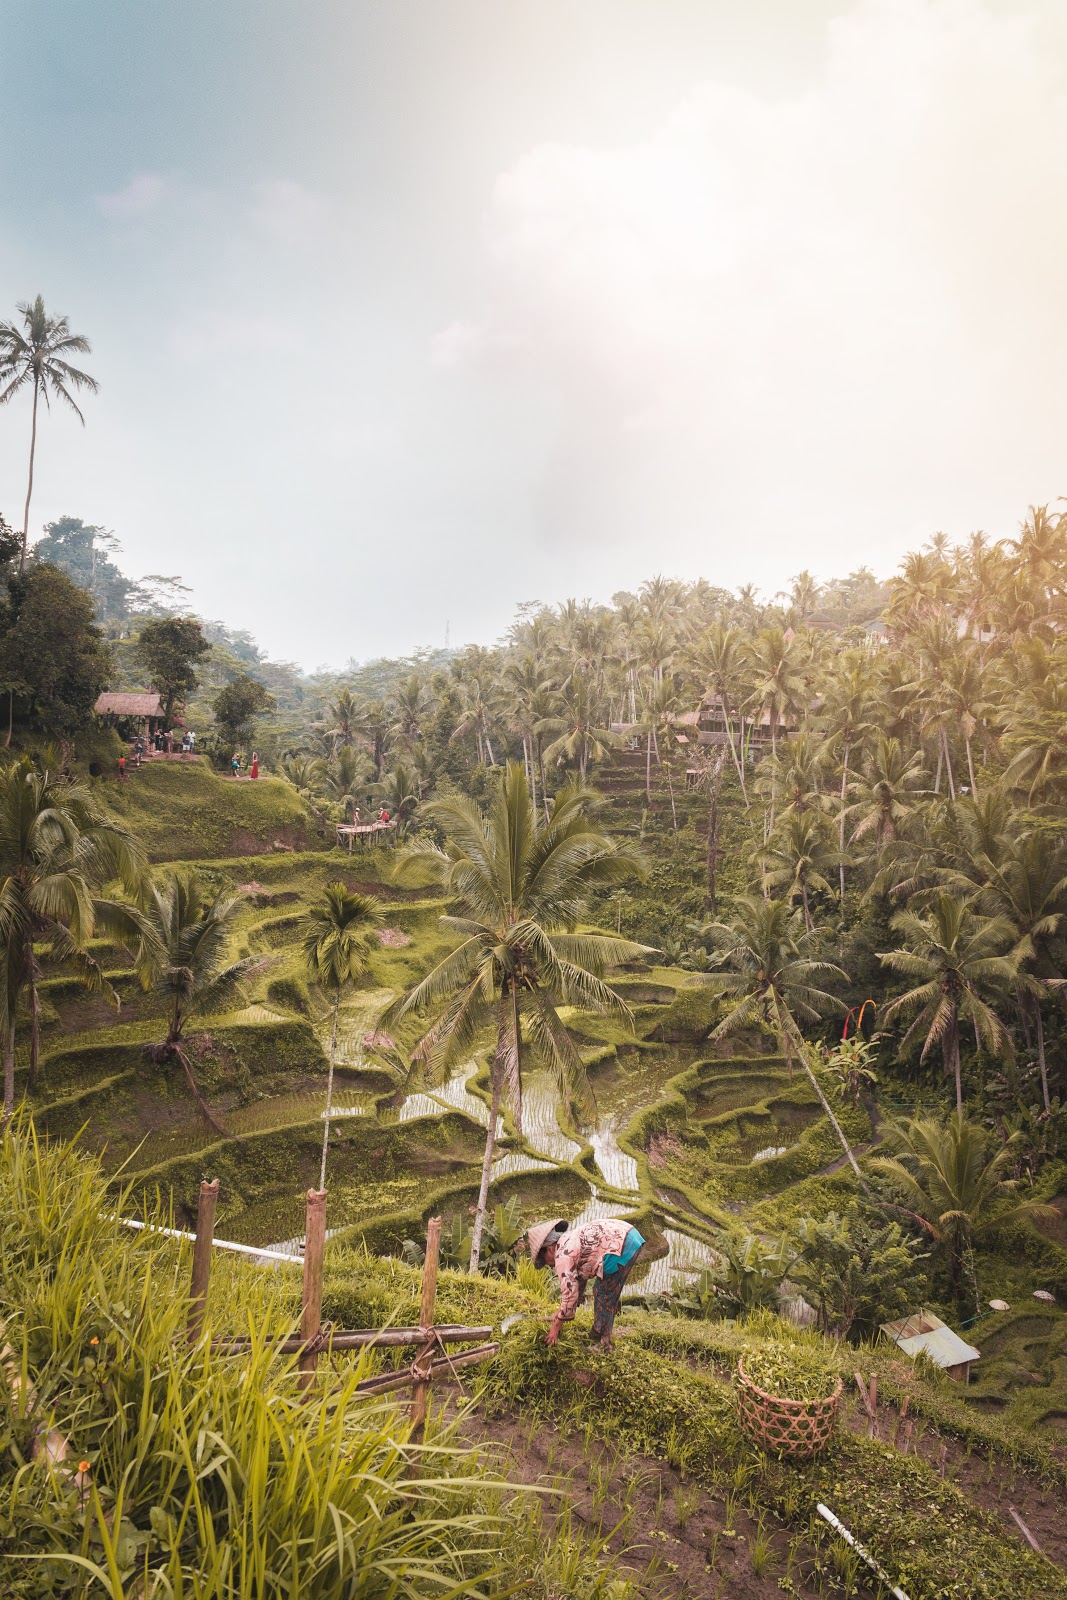 12 Tempat Wisata Terbaik Di Indonesia Yang Mendunia Tripcetera